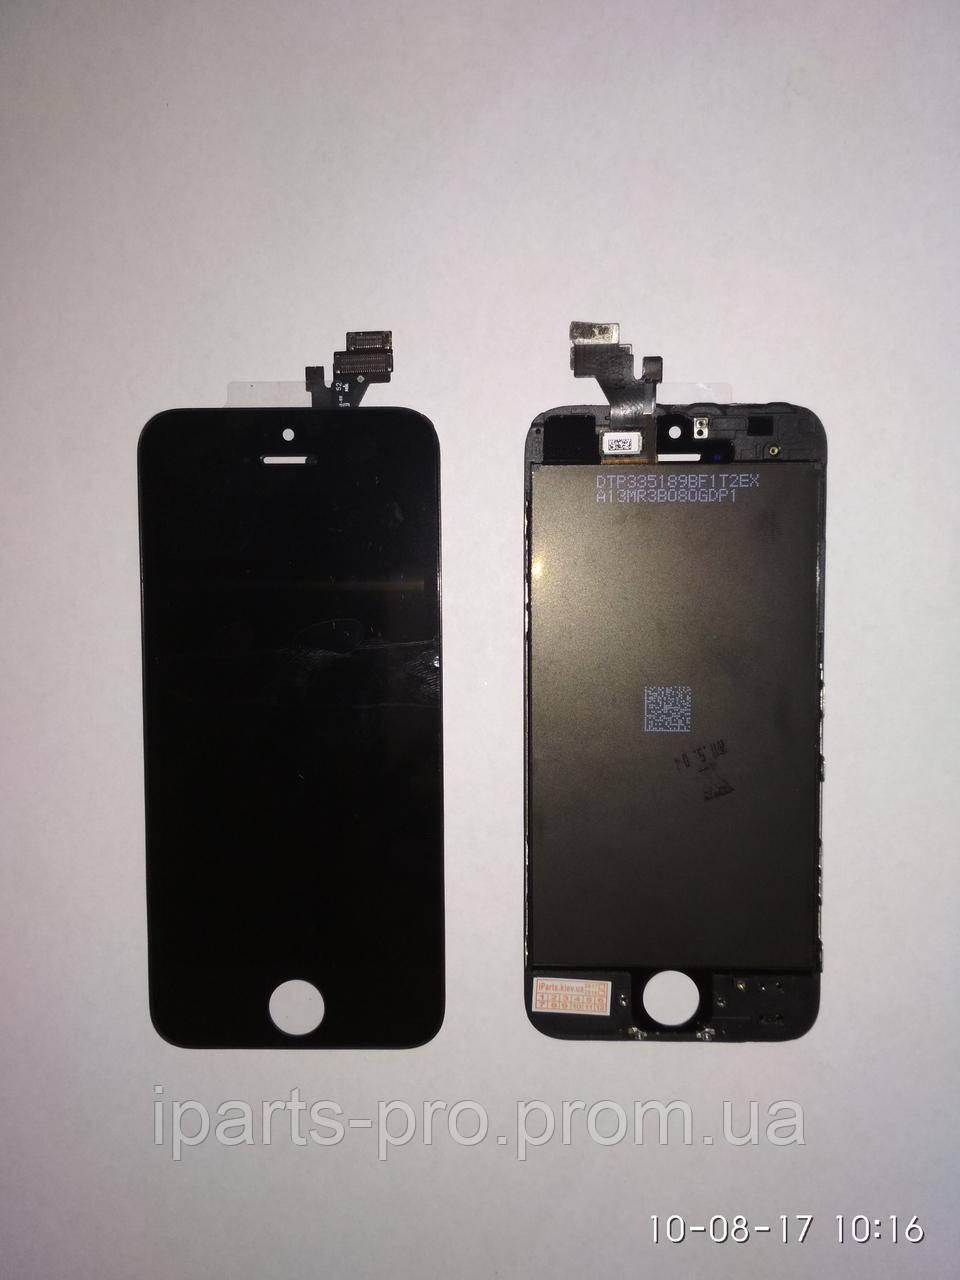 Дисплей Модуль LCD для iPhone5 + Touch Orig ЧЕРНЫЙ